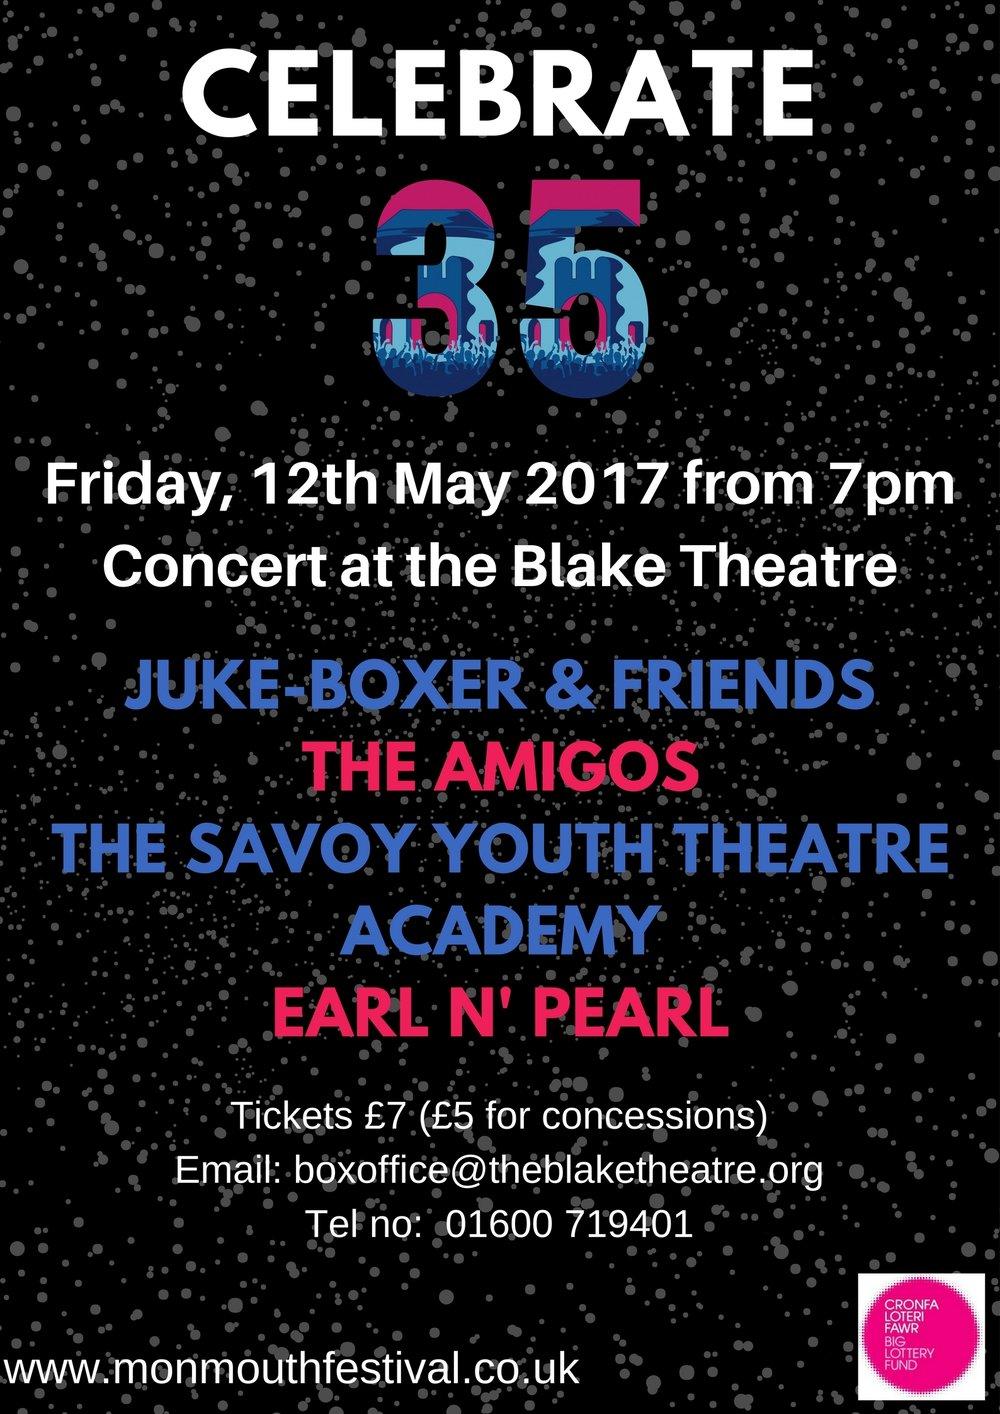 Celebrate 35 Concert poster.jpg